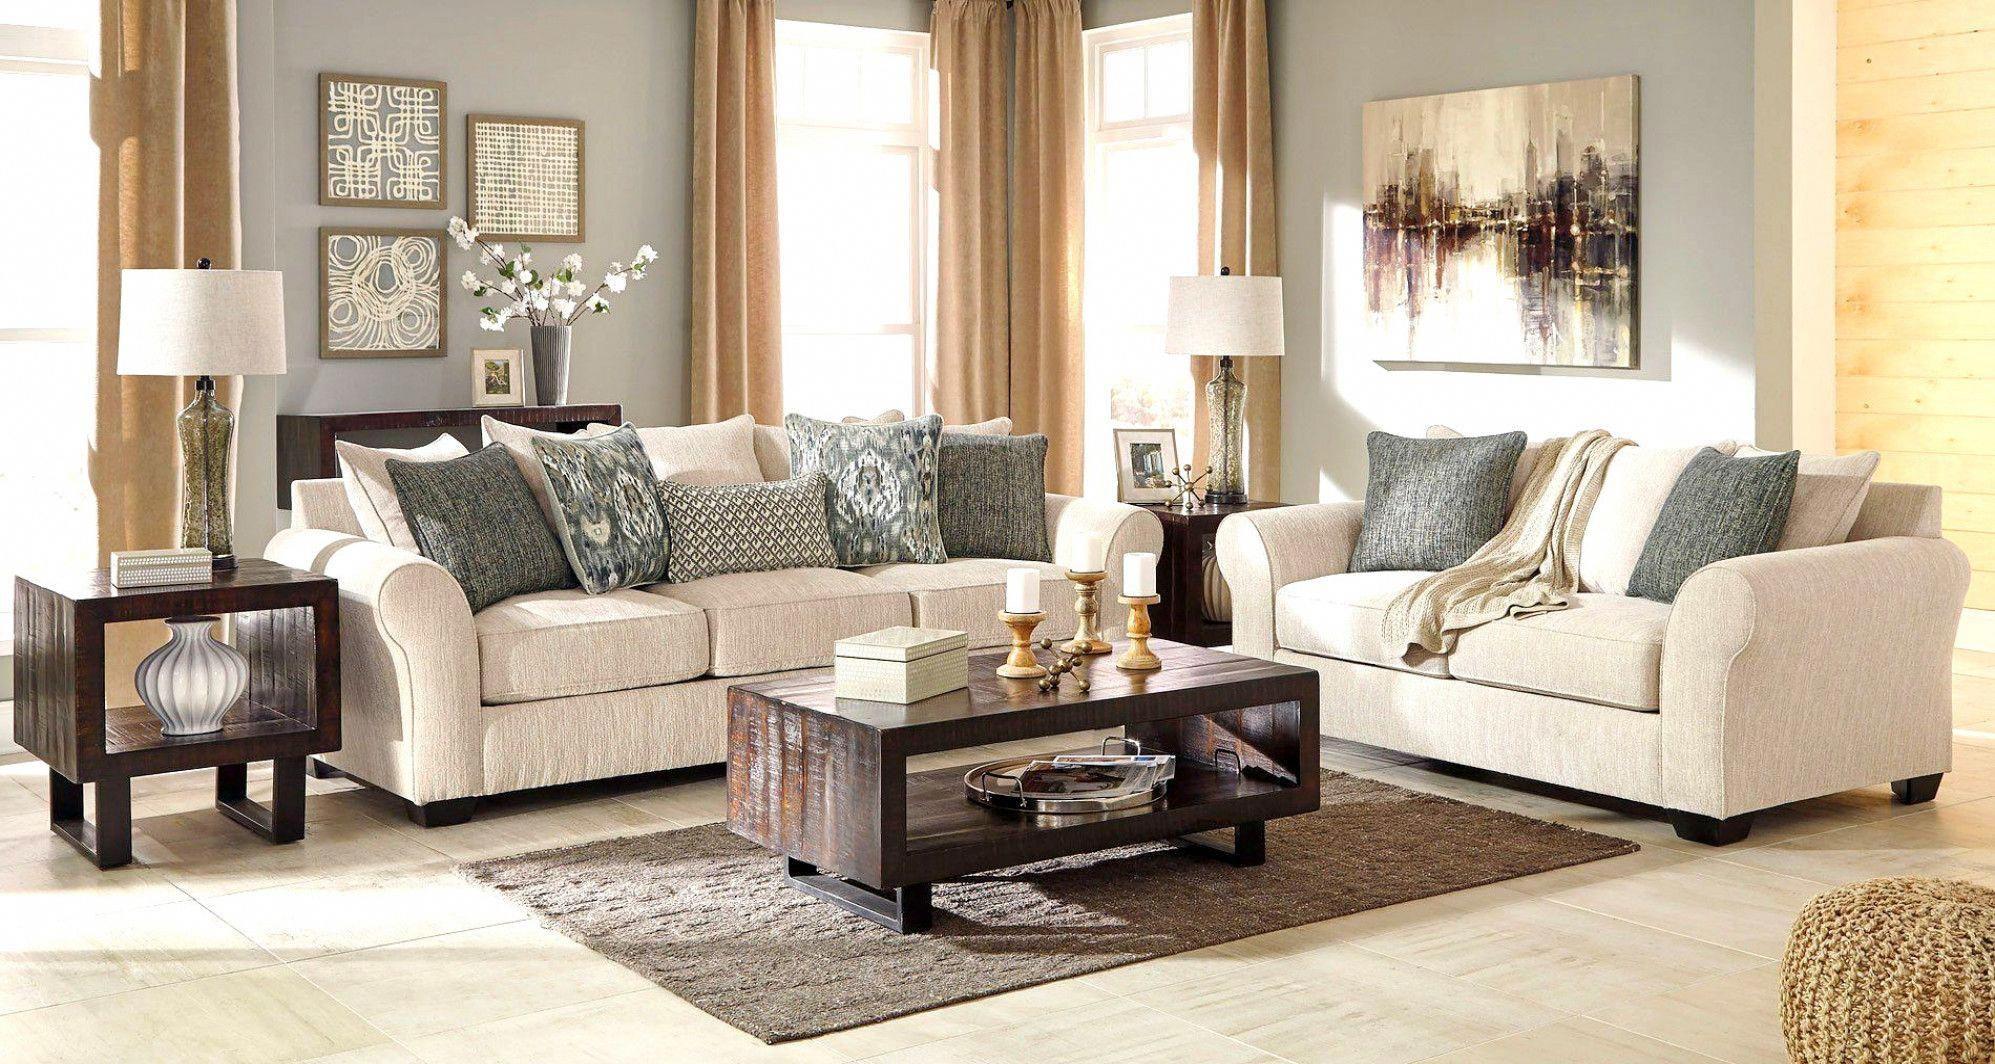 cheap hallway decor  saleprice15 in 2020  living room